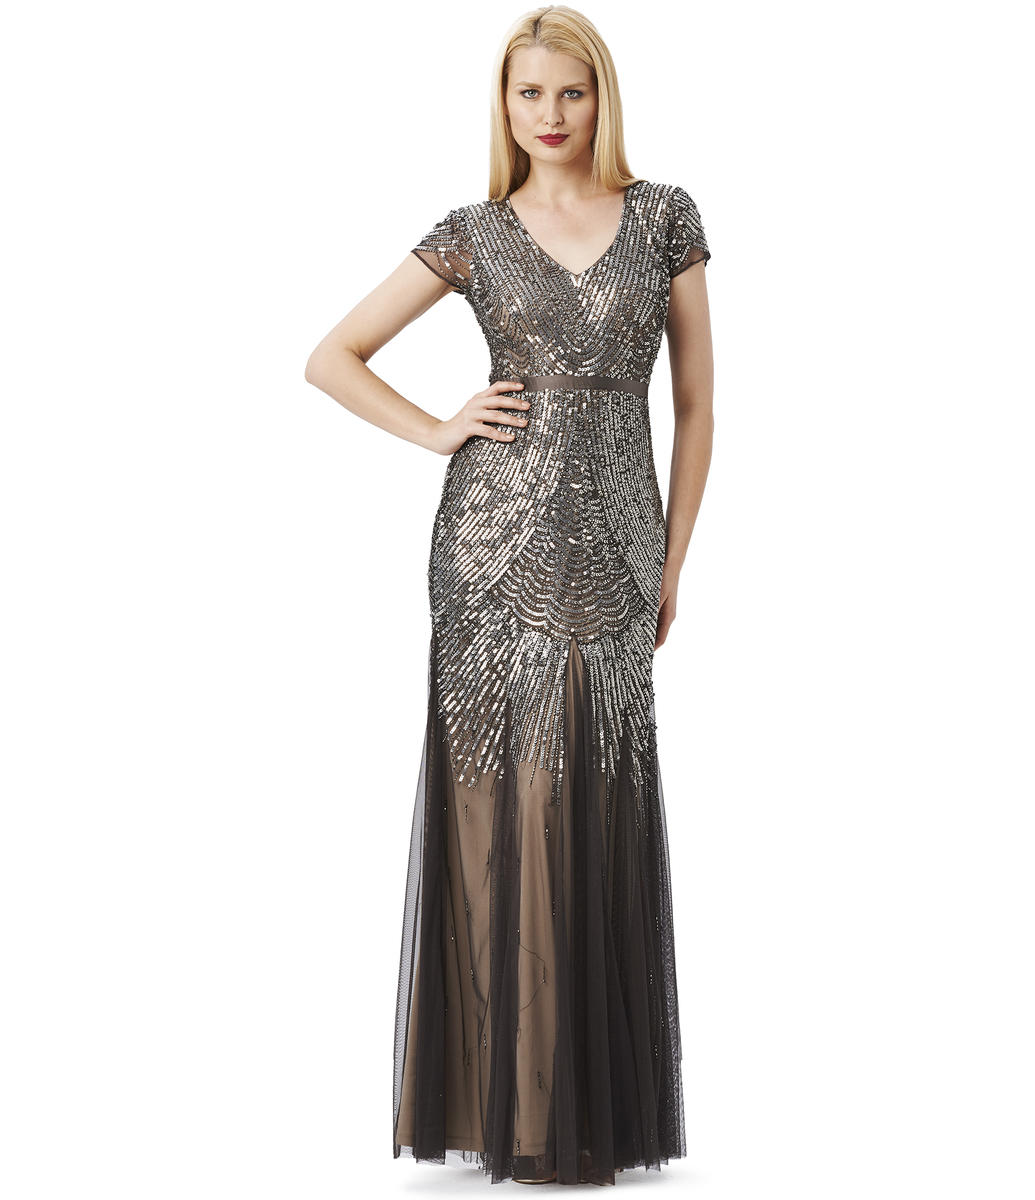 Adrianna Papell Prom Dress - Ocodea.com